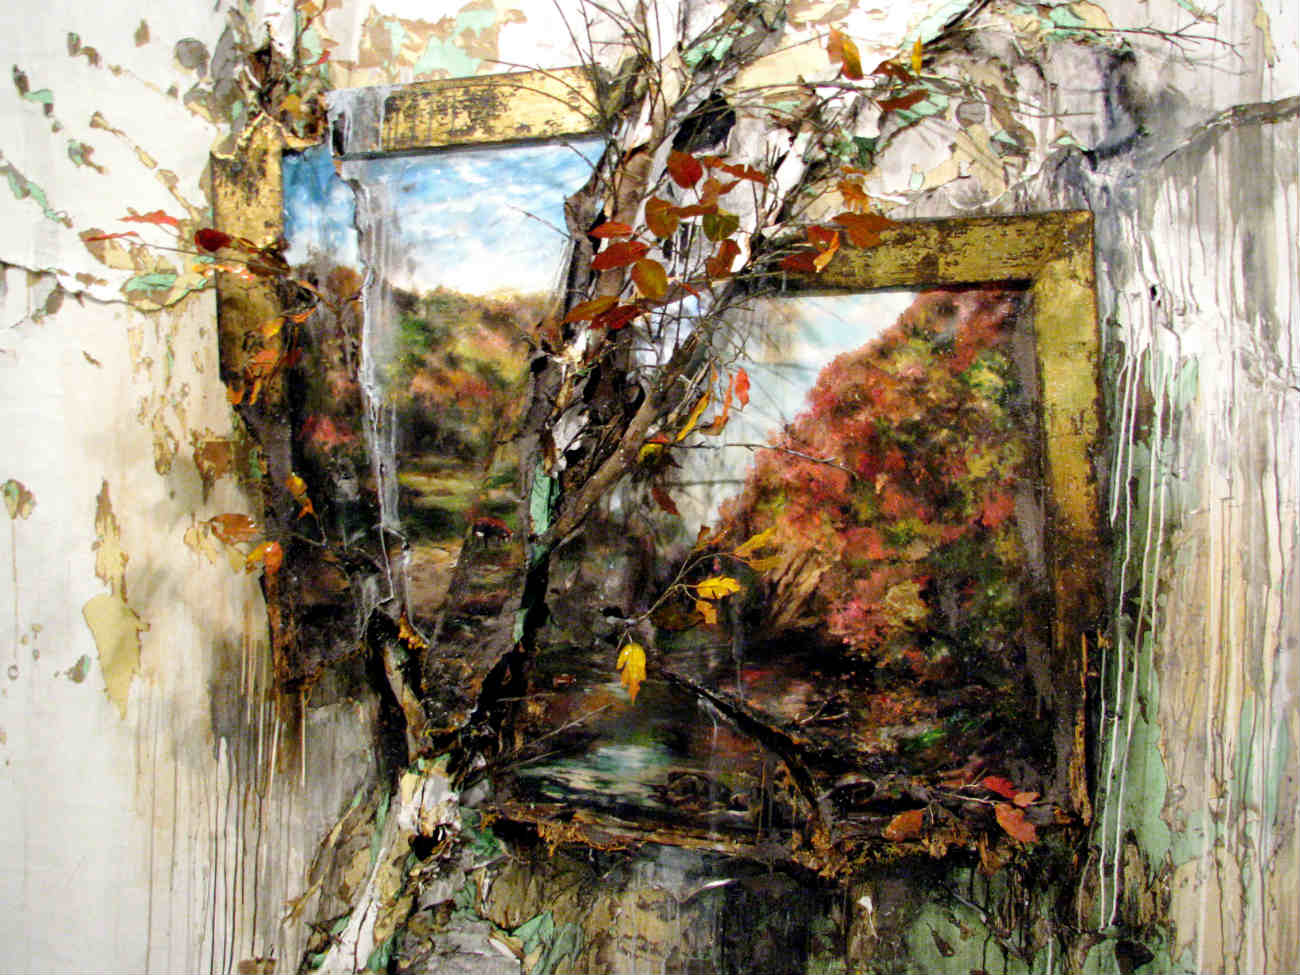 valerie hegarty painting decomposing